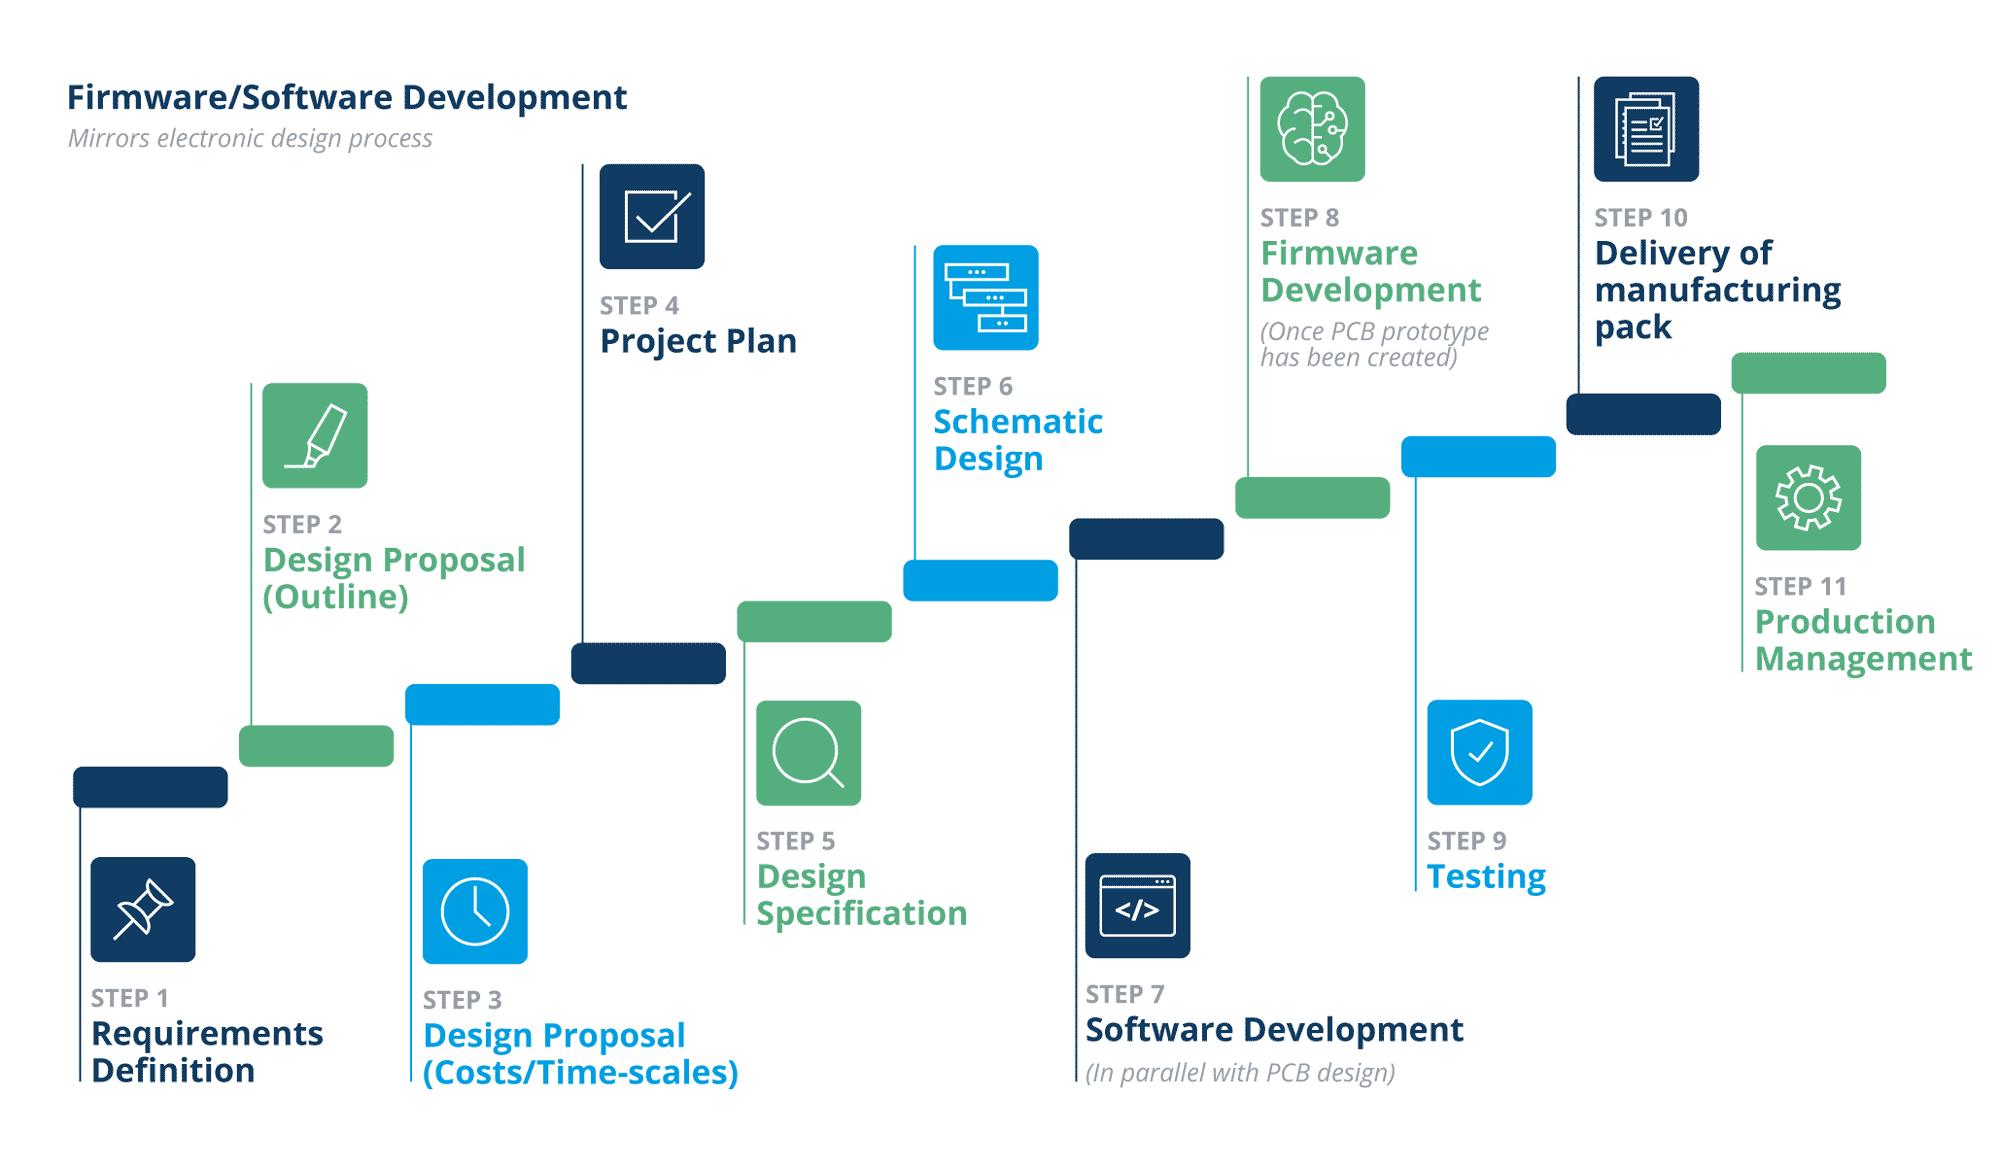 Firmware and Software Development